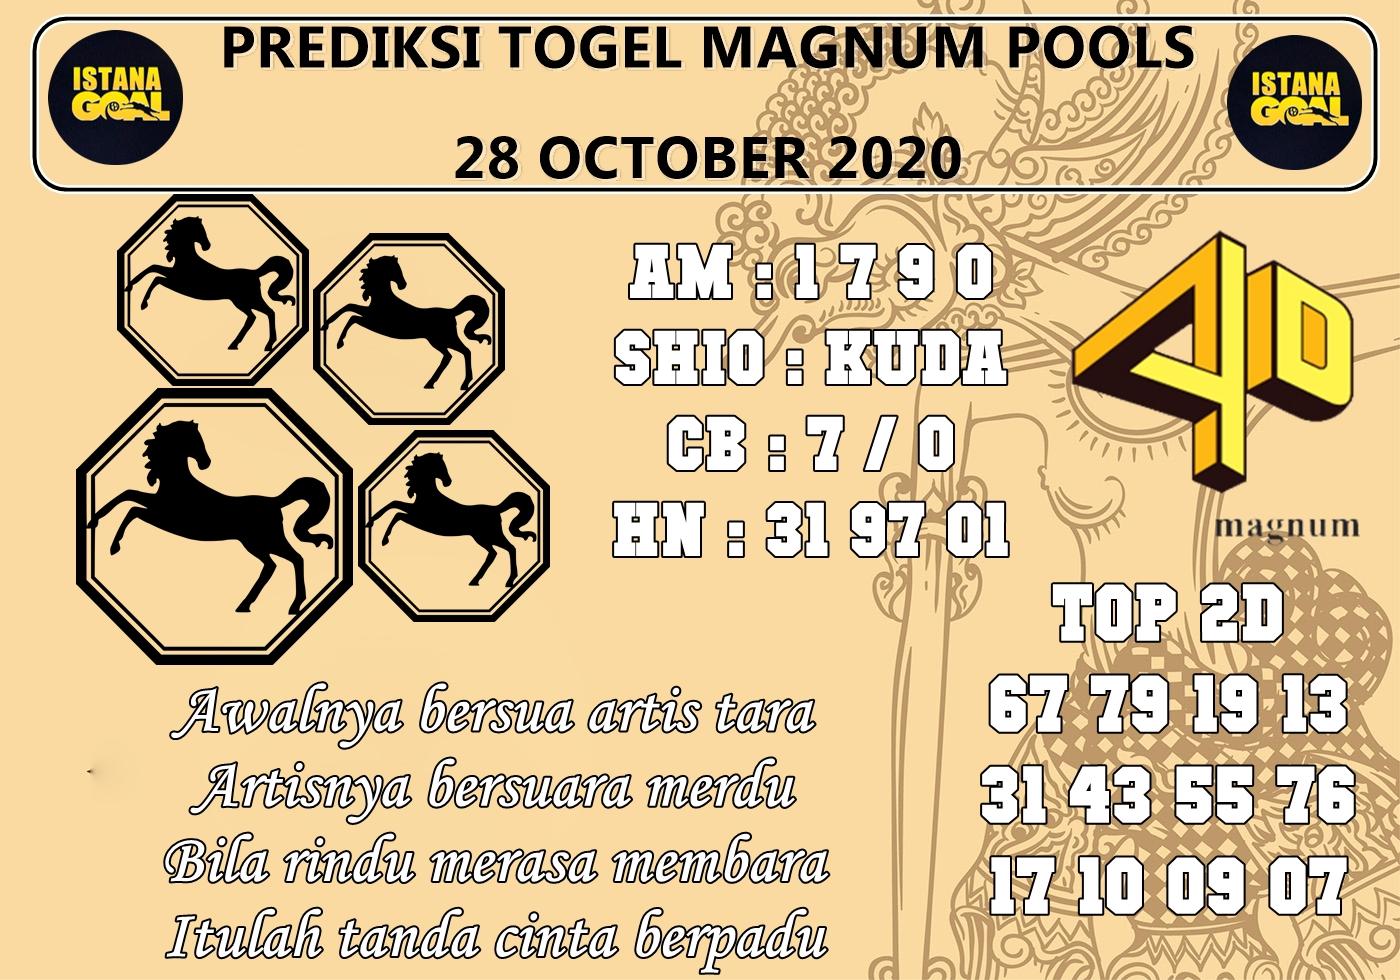 PREDIKSI TOGEL MAGNUM POOLS 28 OCTOBER 2020